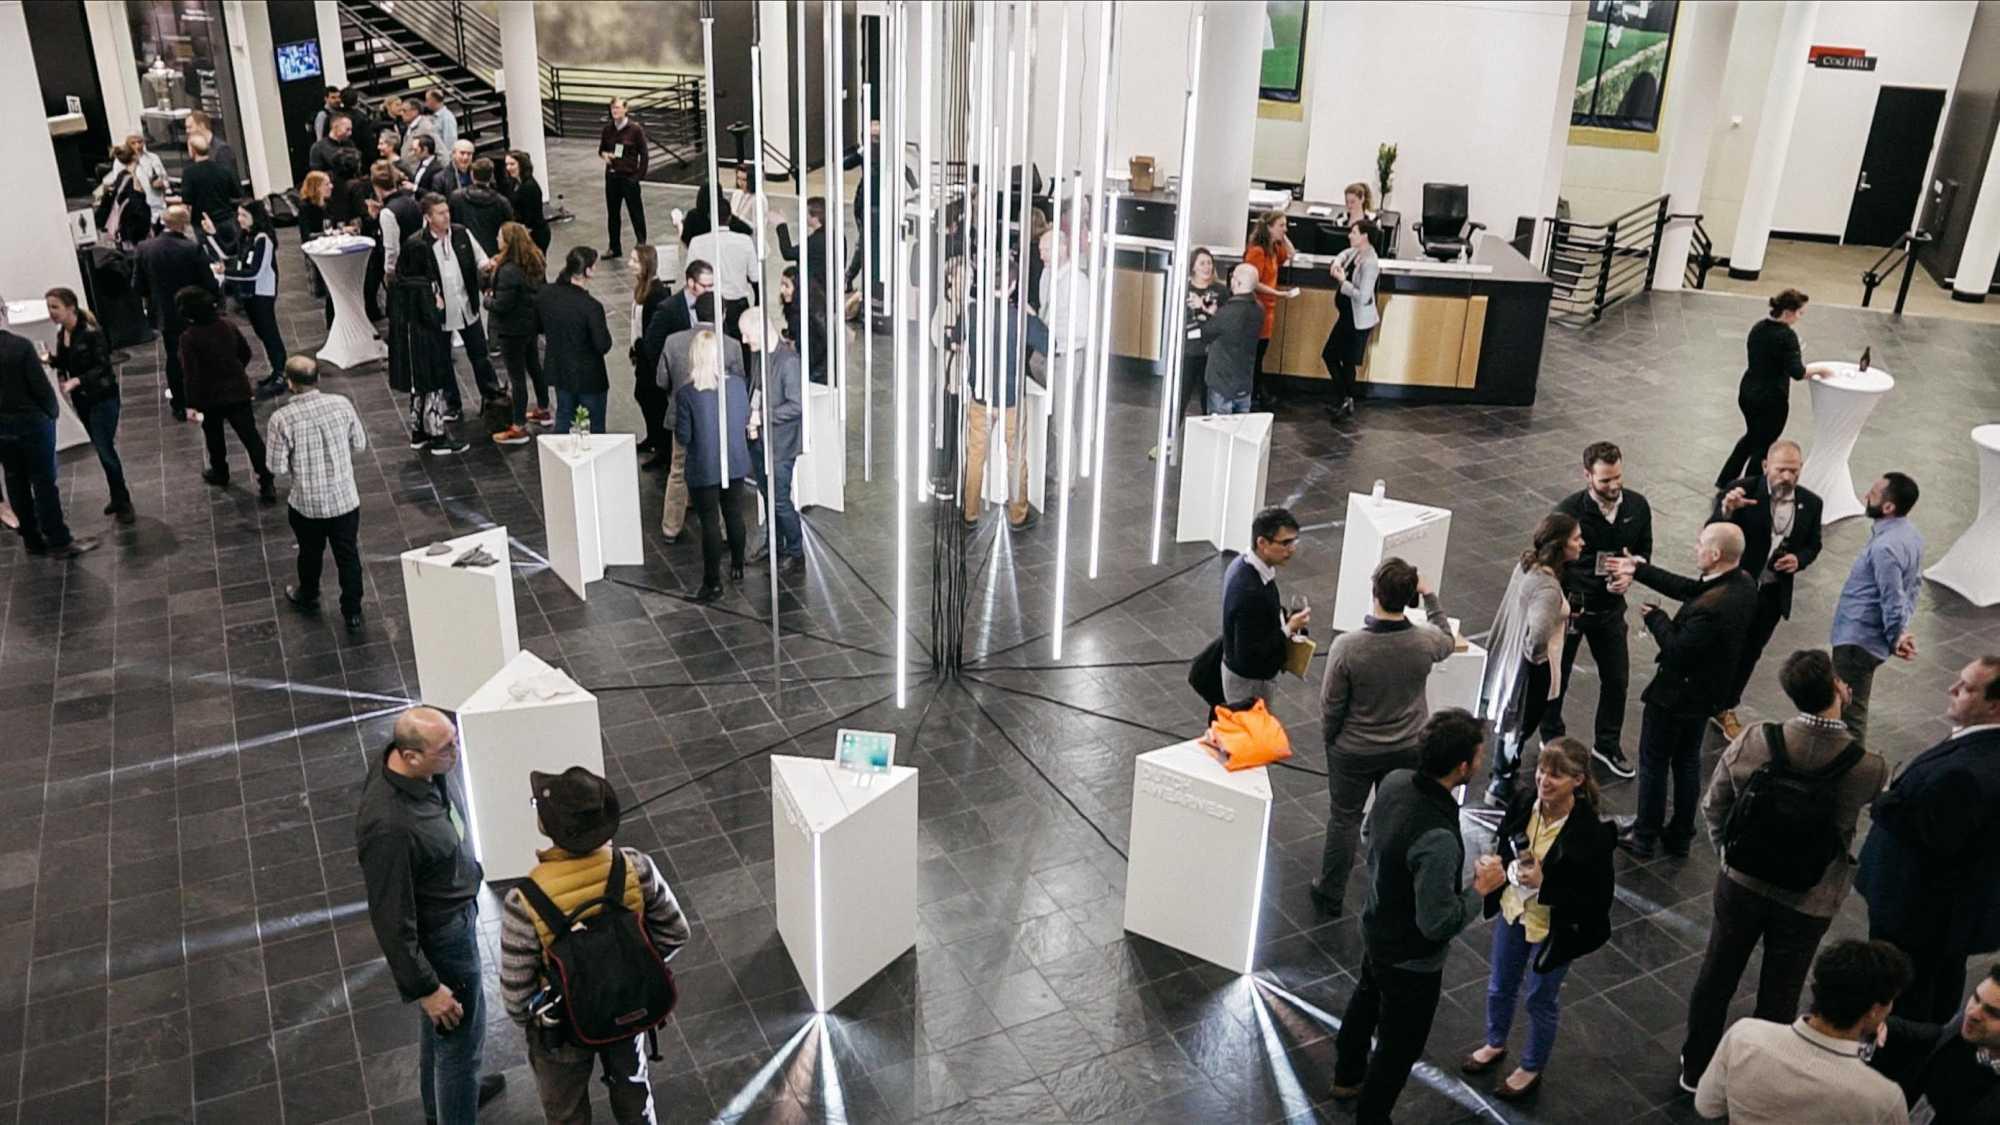 LAUNCH Circular Innovation Summit at Tiger Woods Auditurium Innovator Showcases